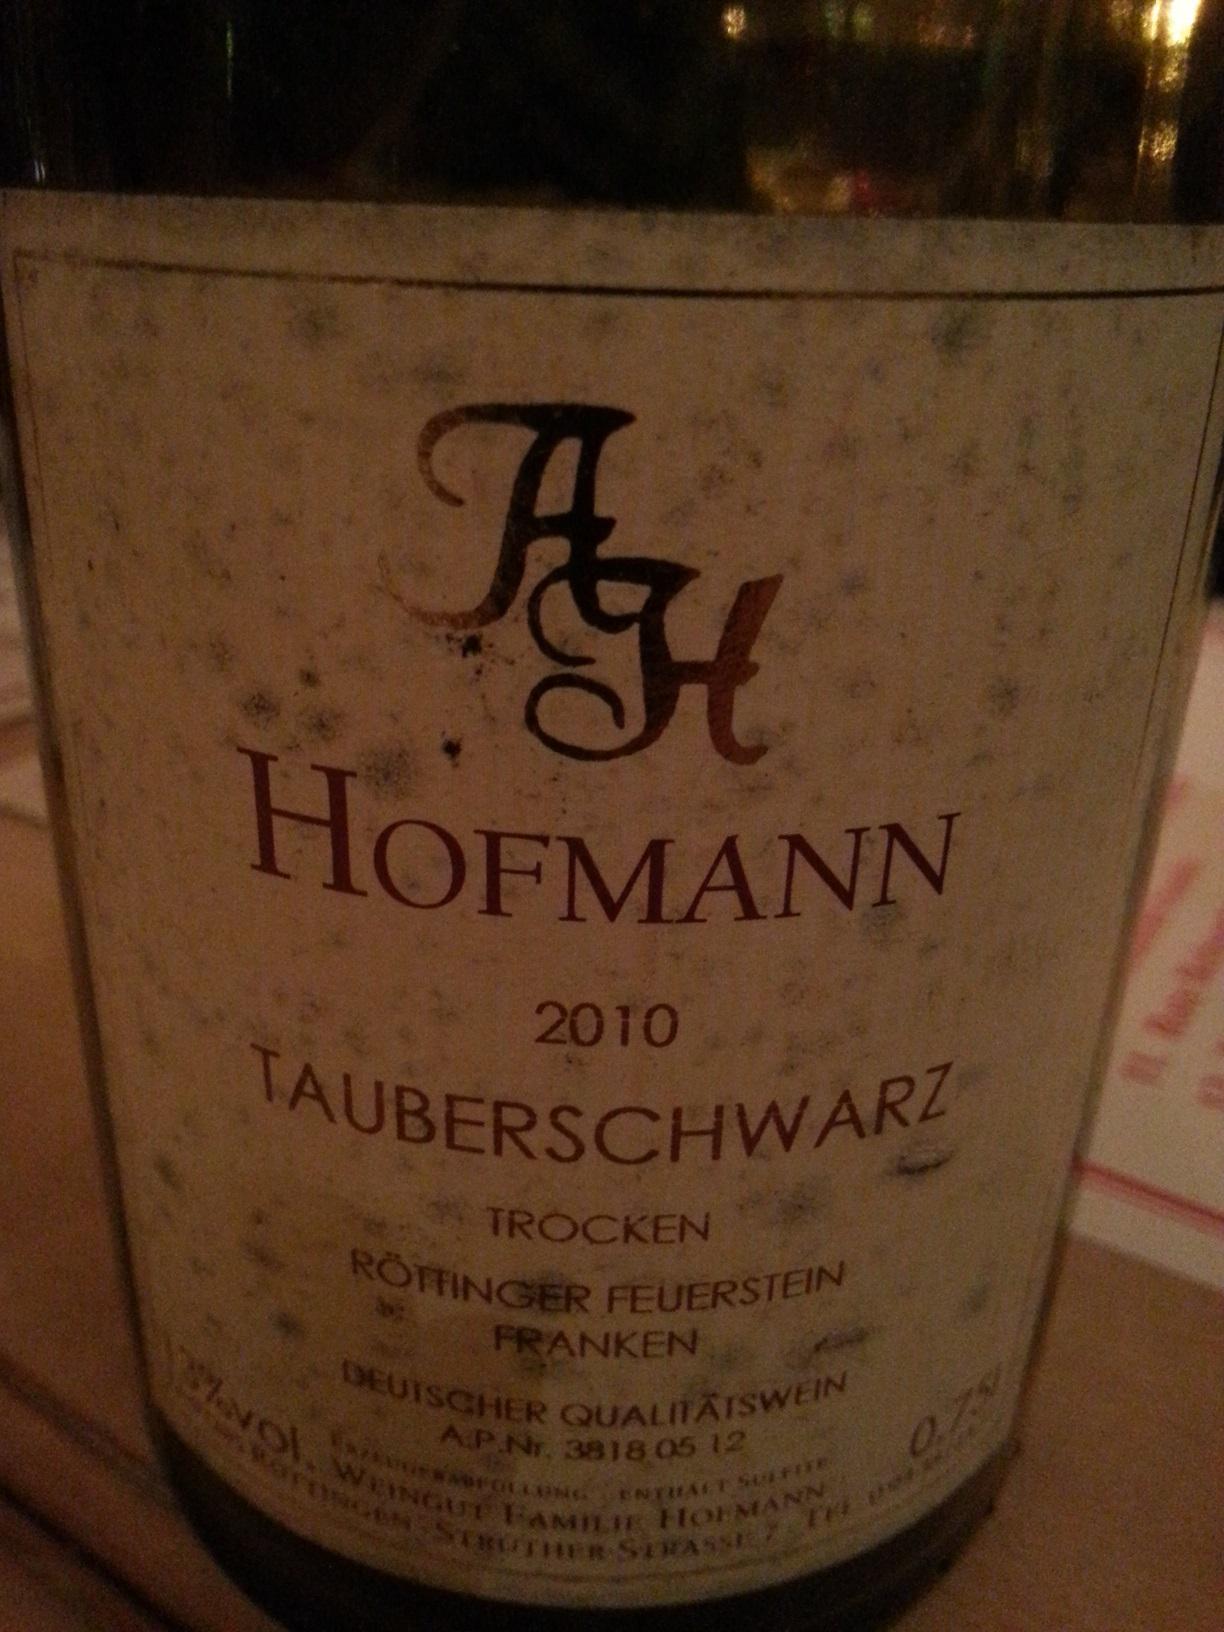 2010 Tauberschwarz | Hofmann